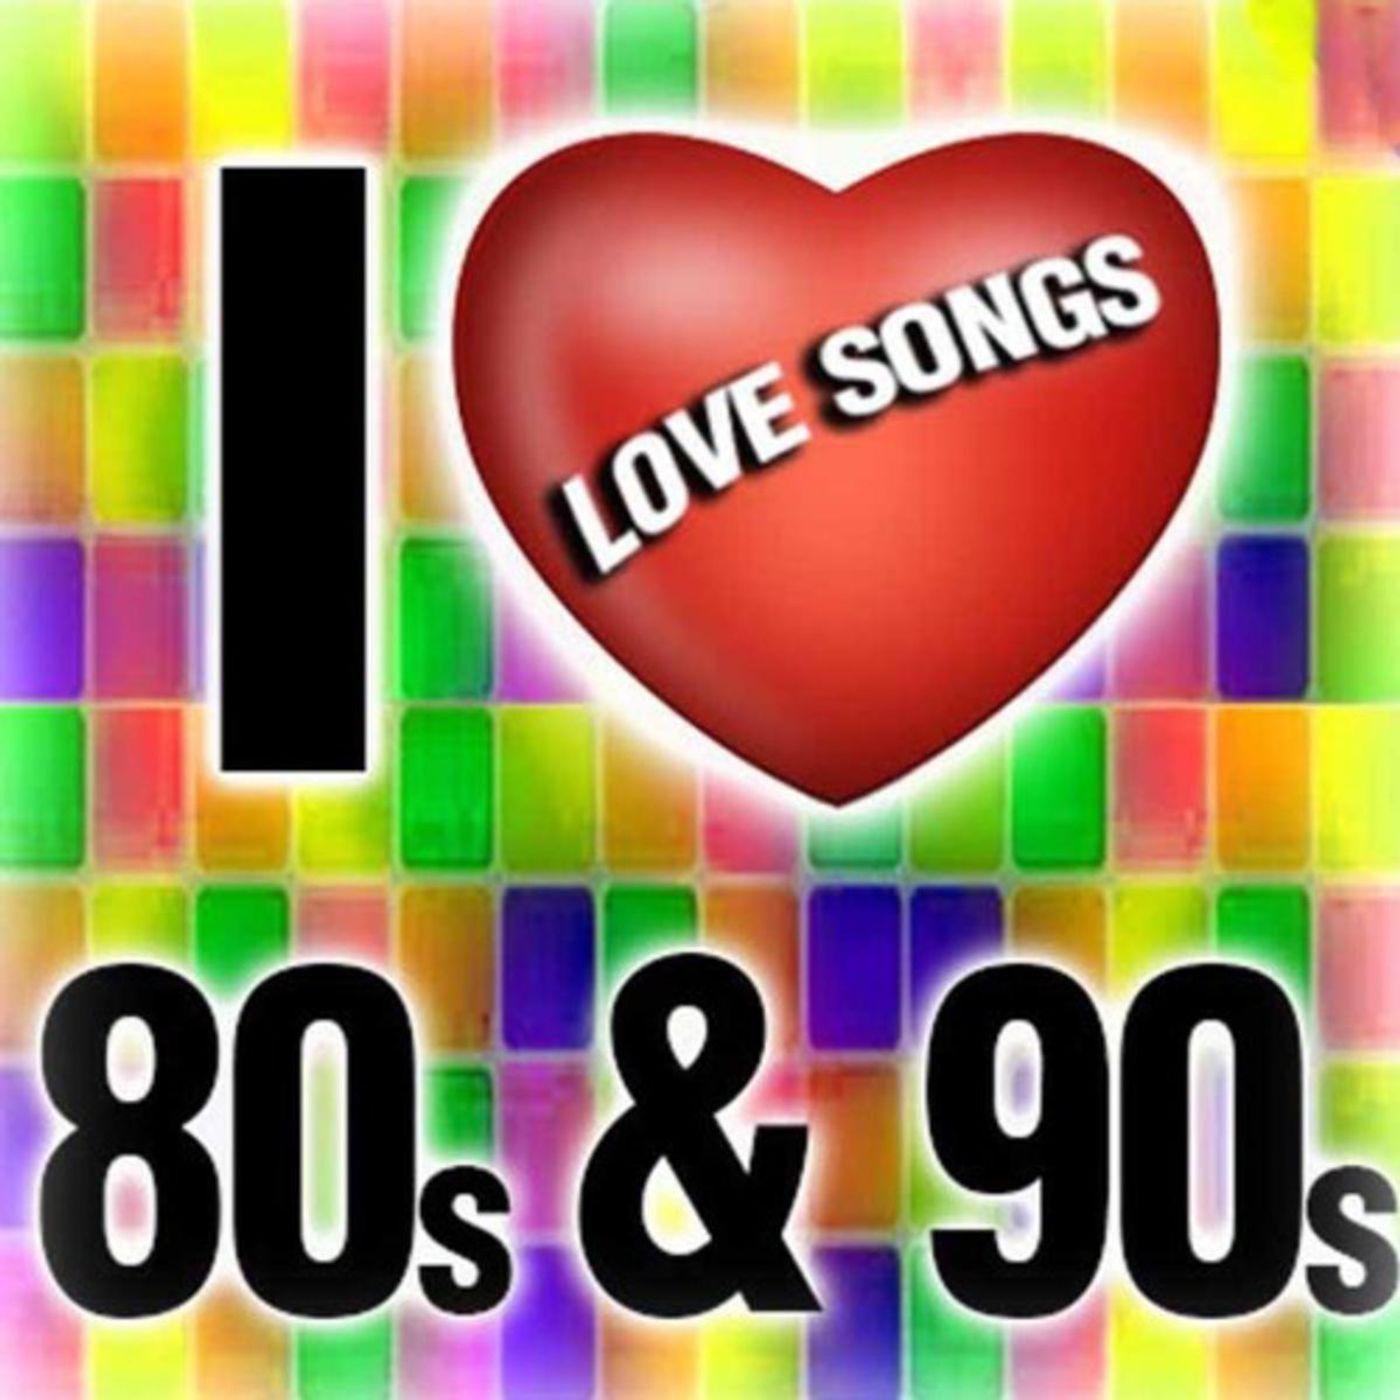 Love Songs Flashbacks - 80s & 90s LIVE